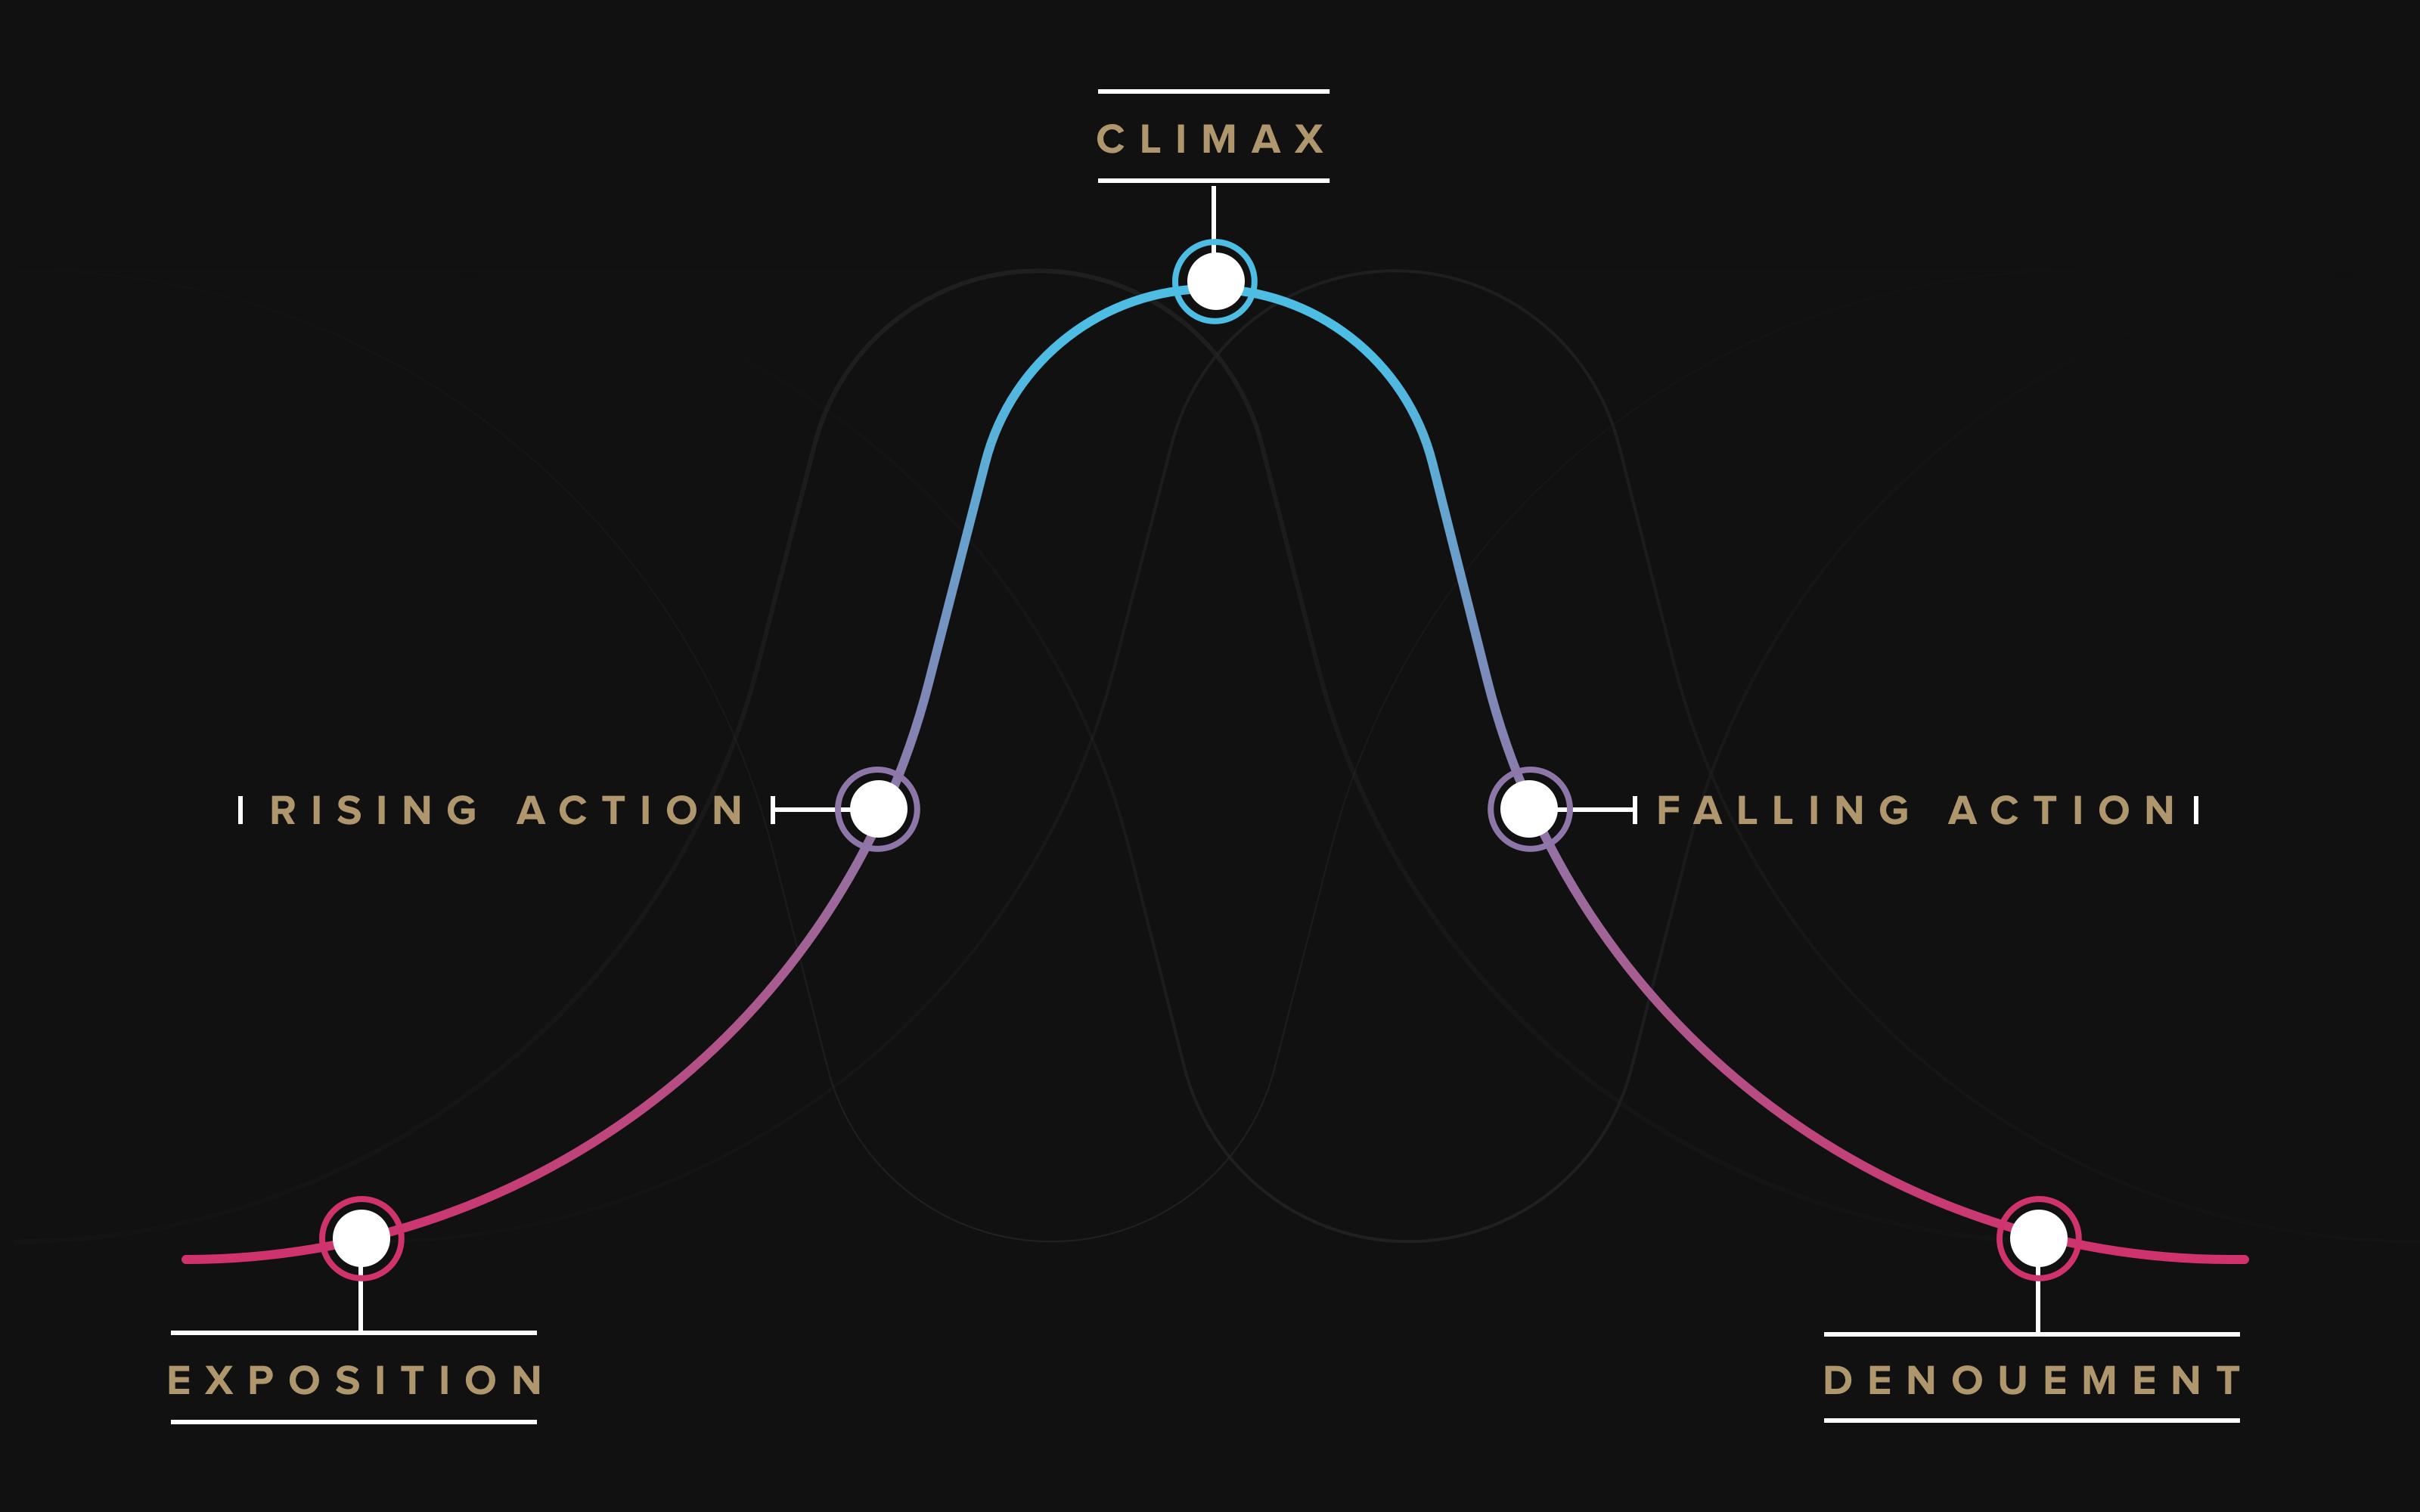 dramatic arc story map